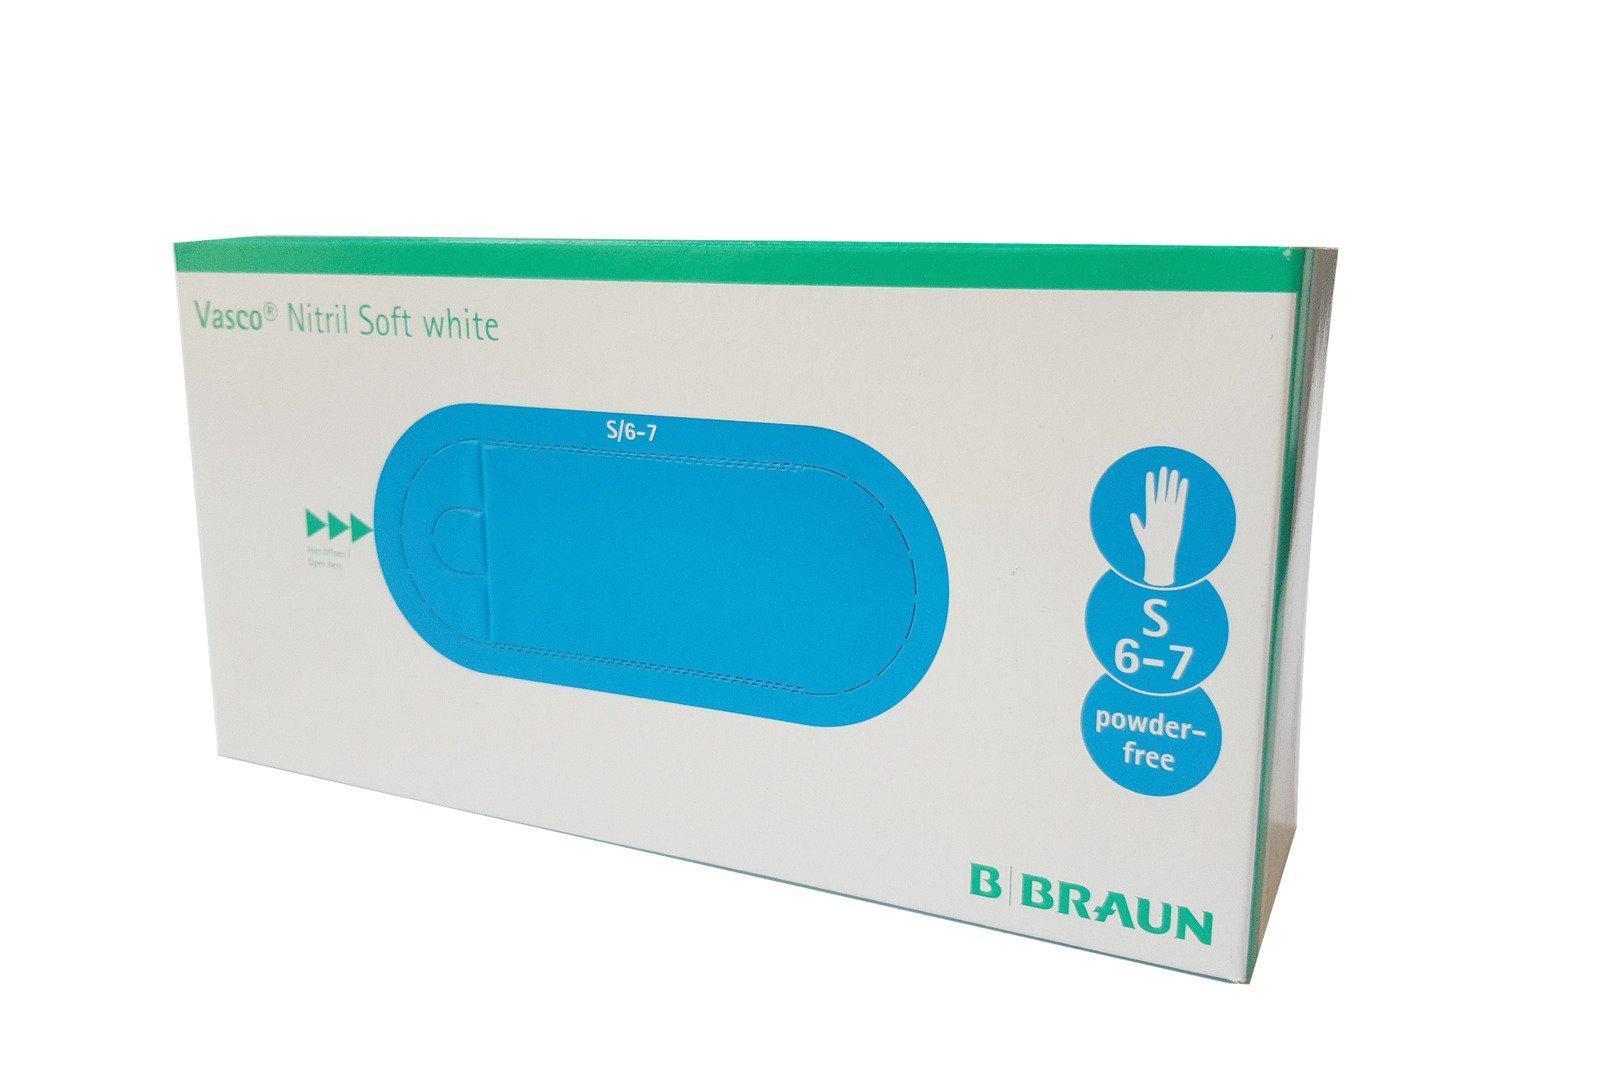 B Braun Vasco Nitril Soft White Protective Gloves 200 pcs Size S 6-7 Latex-Free